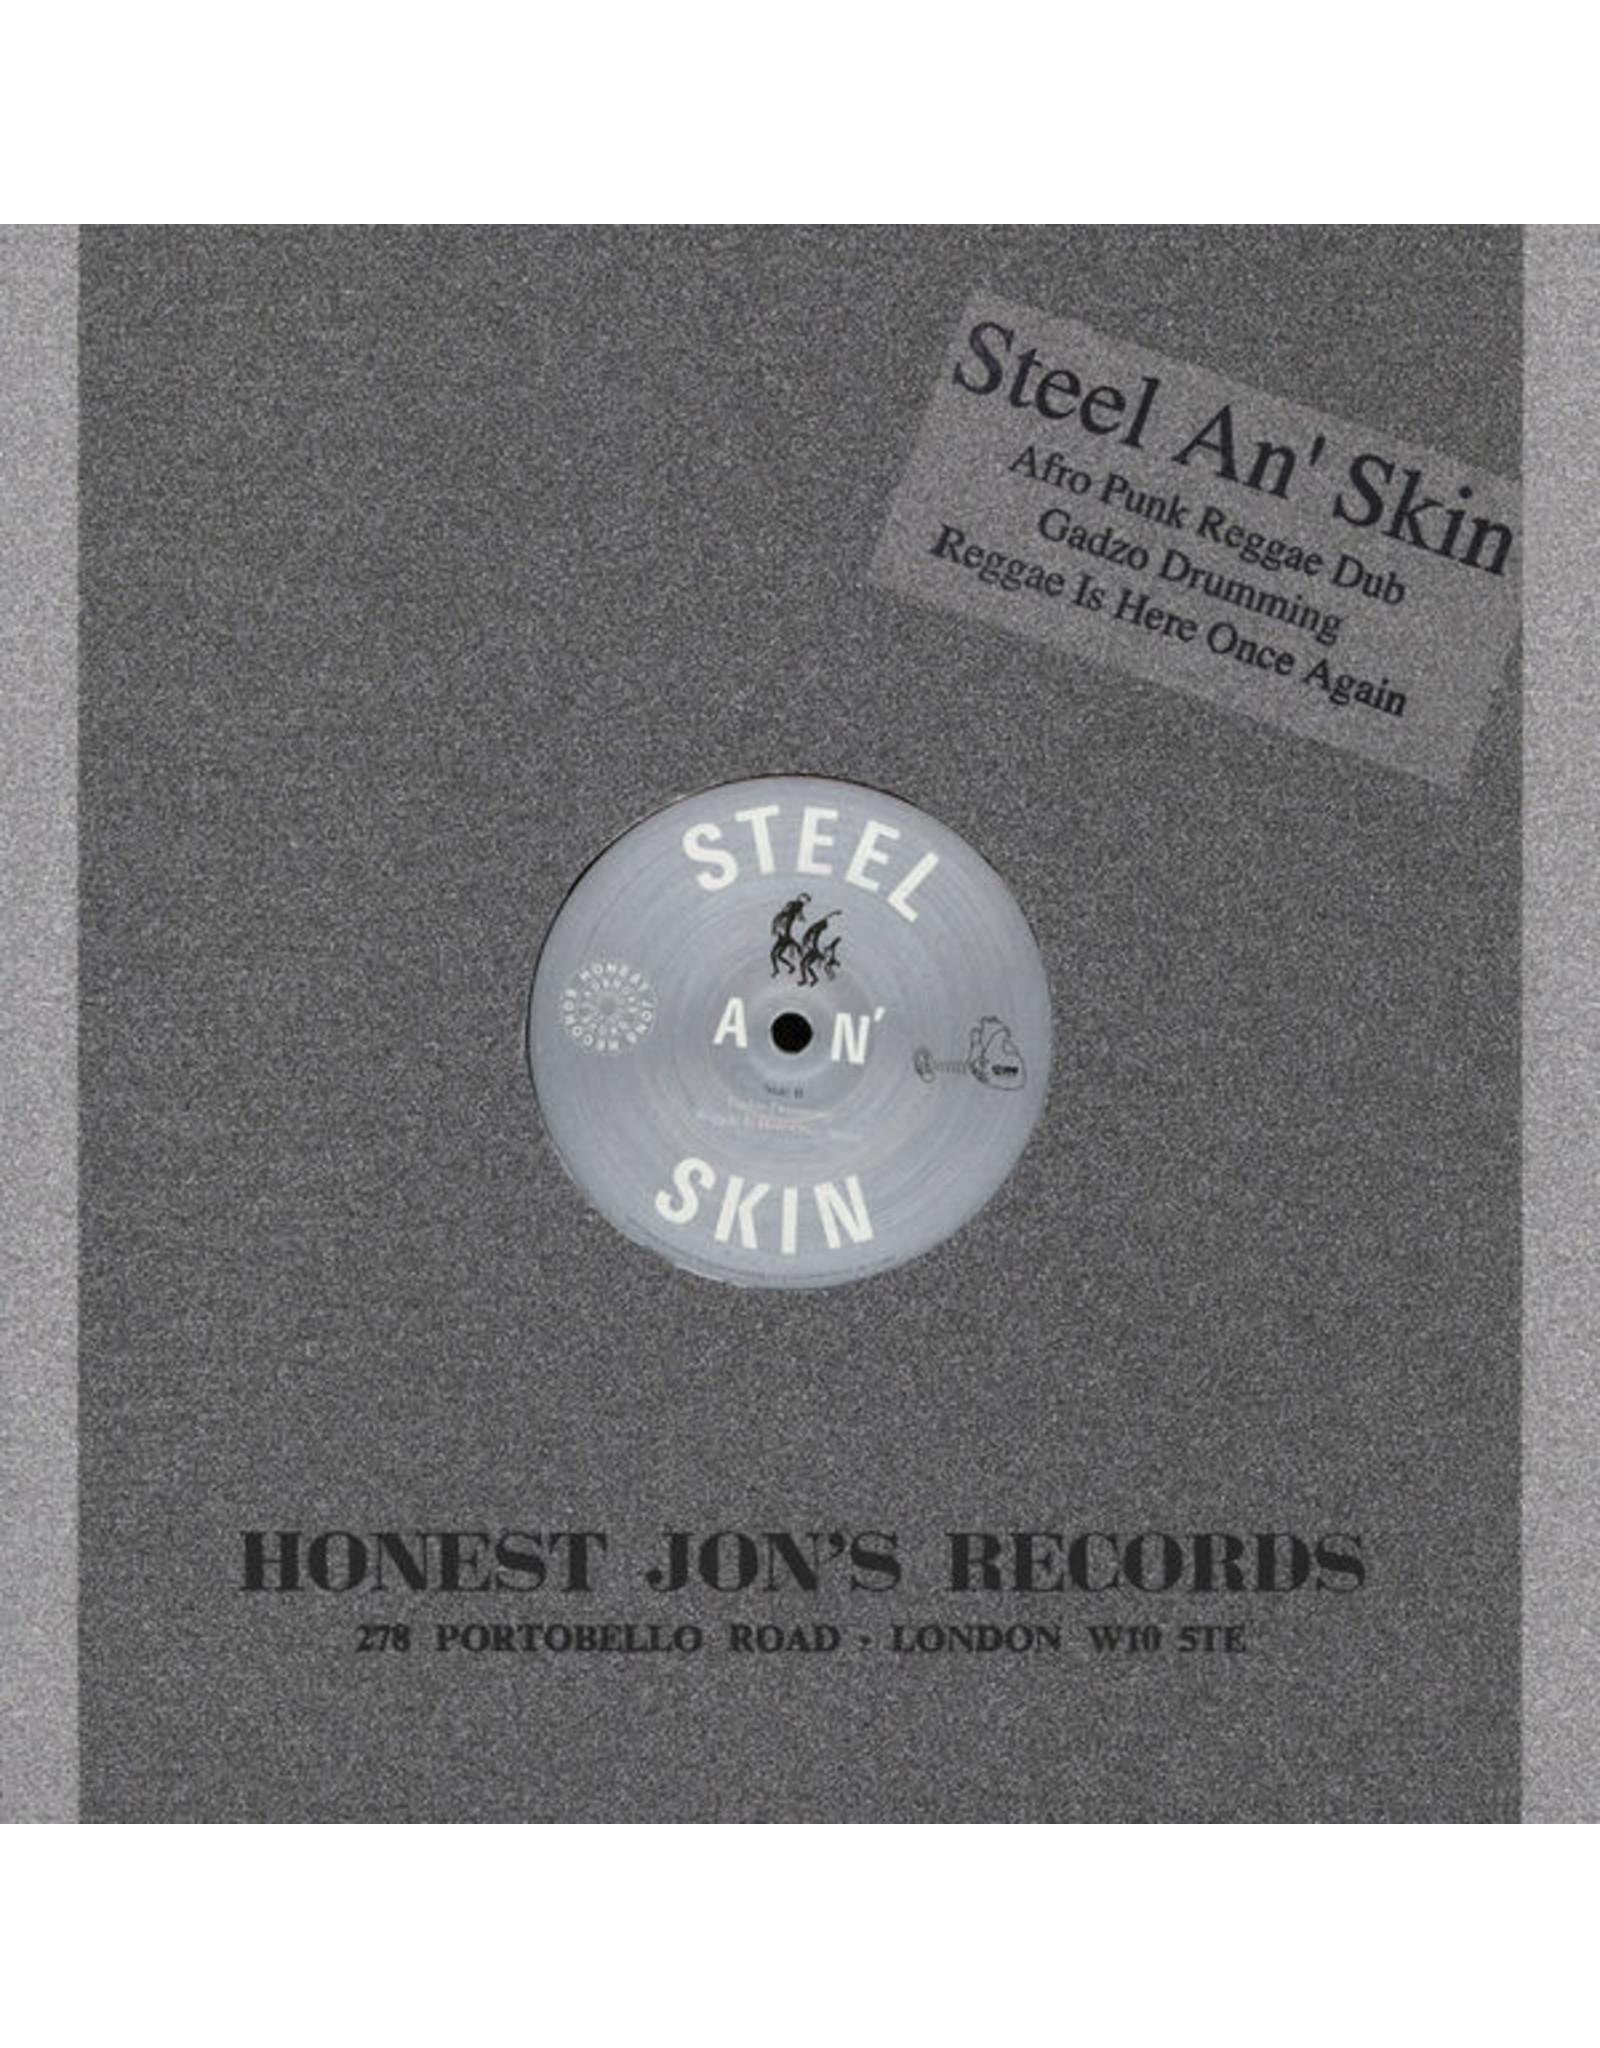 "New Vinyl Steel An' Skin - Afro Punk Reggae Dub 12"""